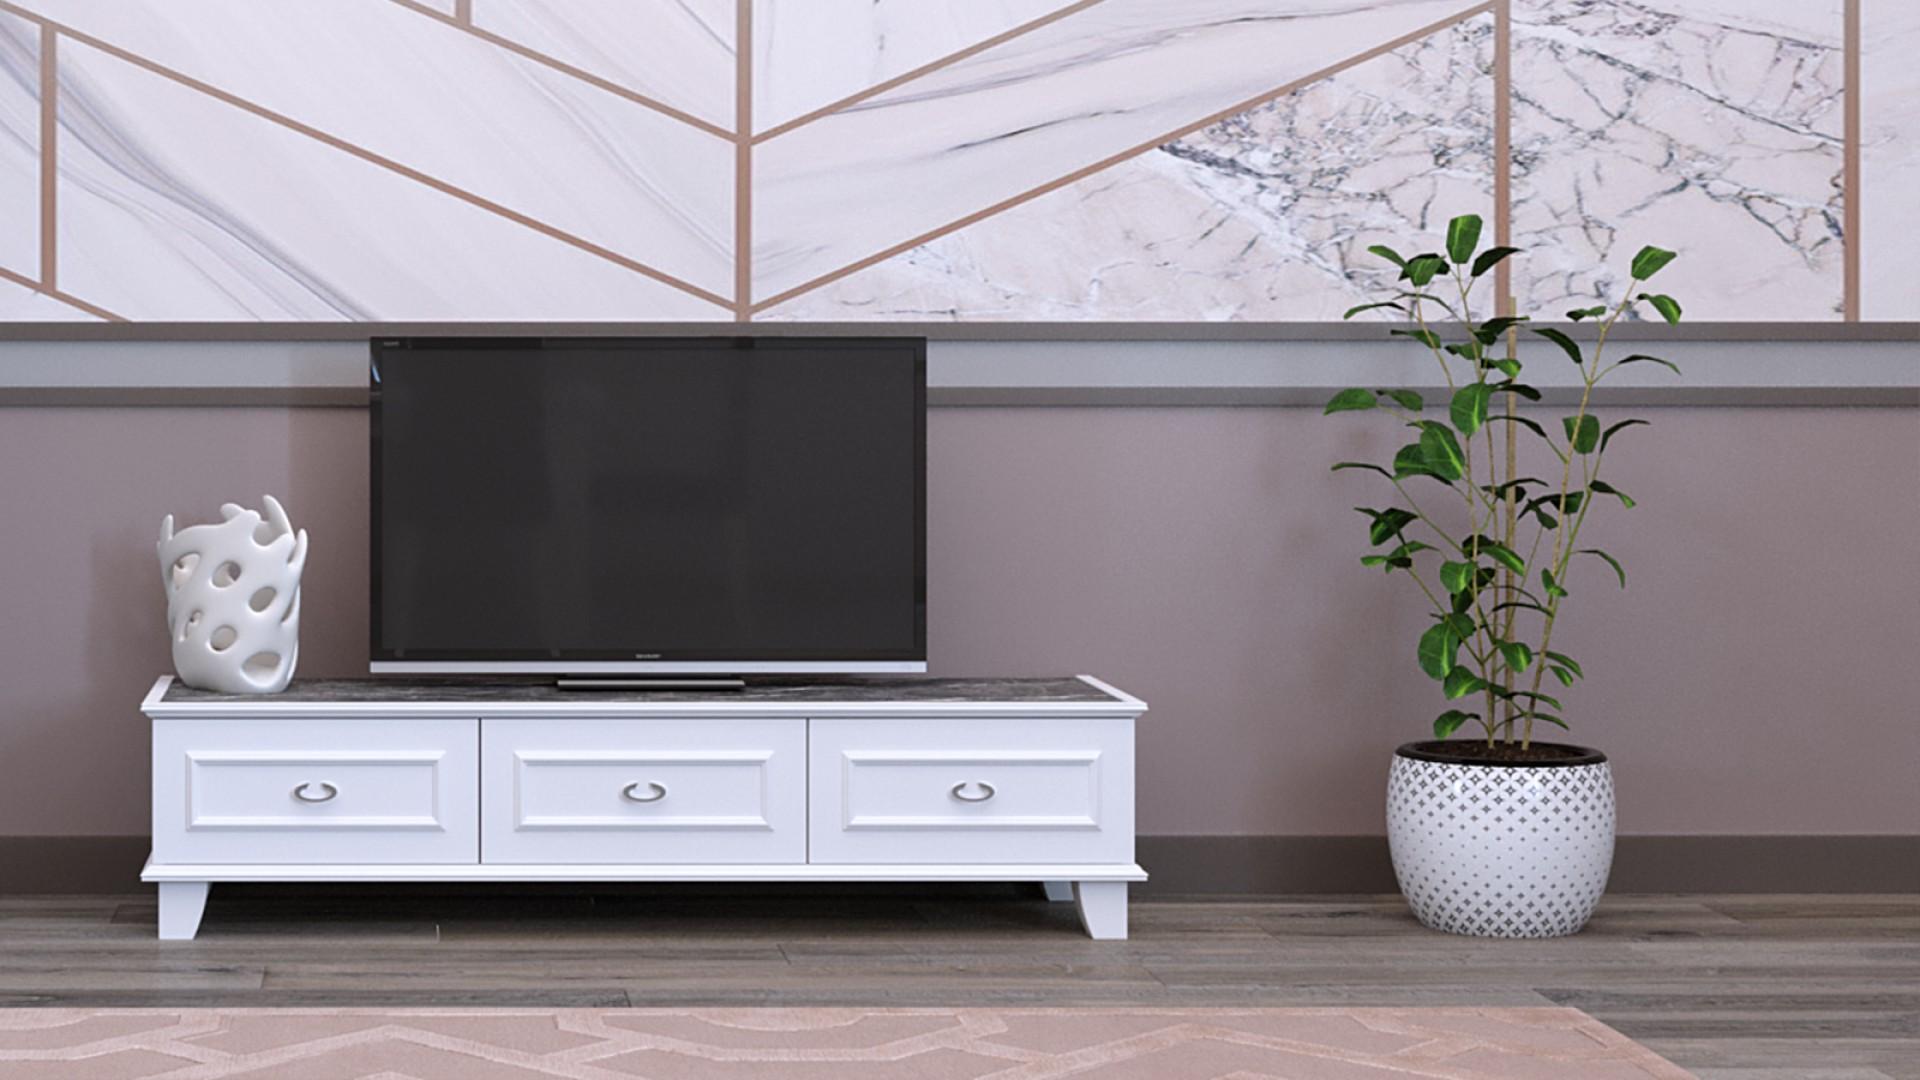 Luna ağ TV altı